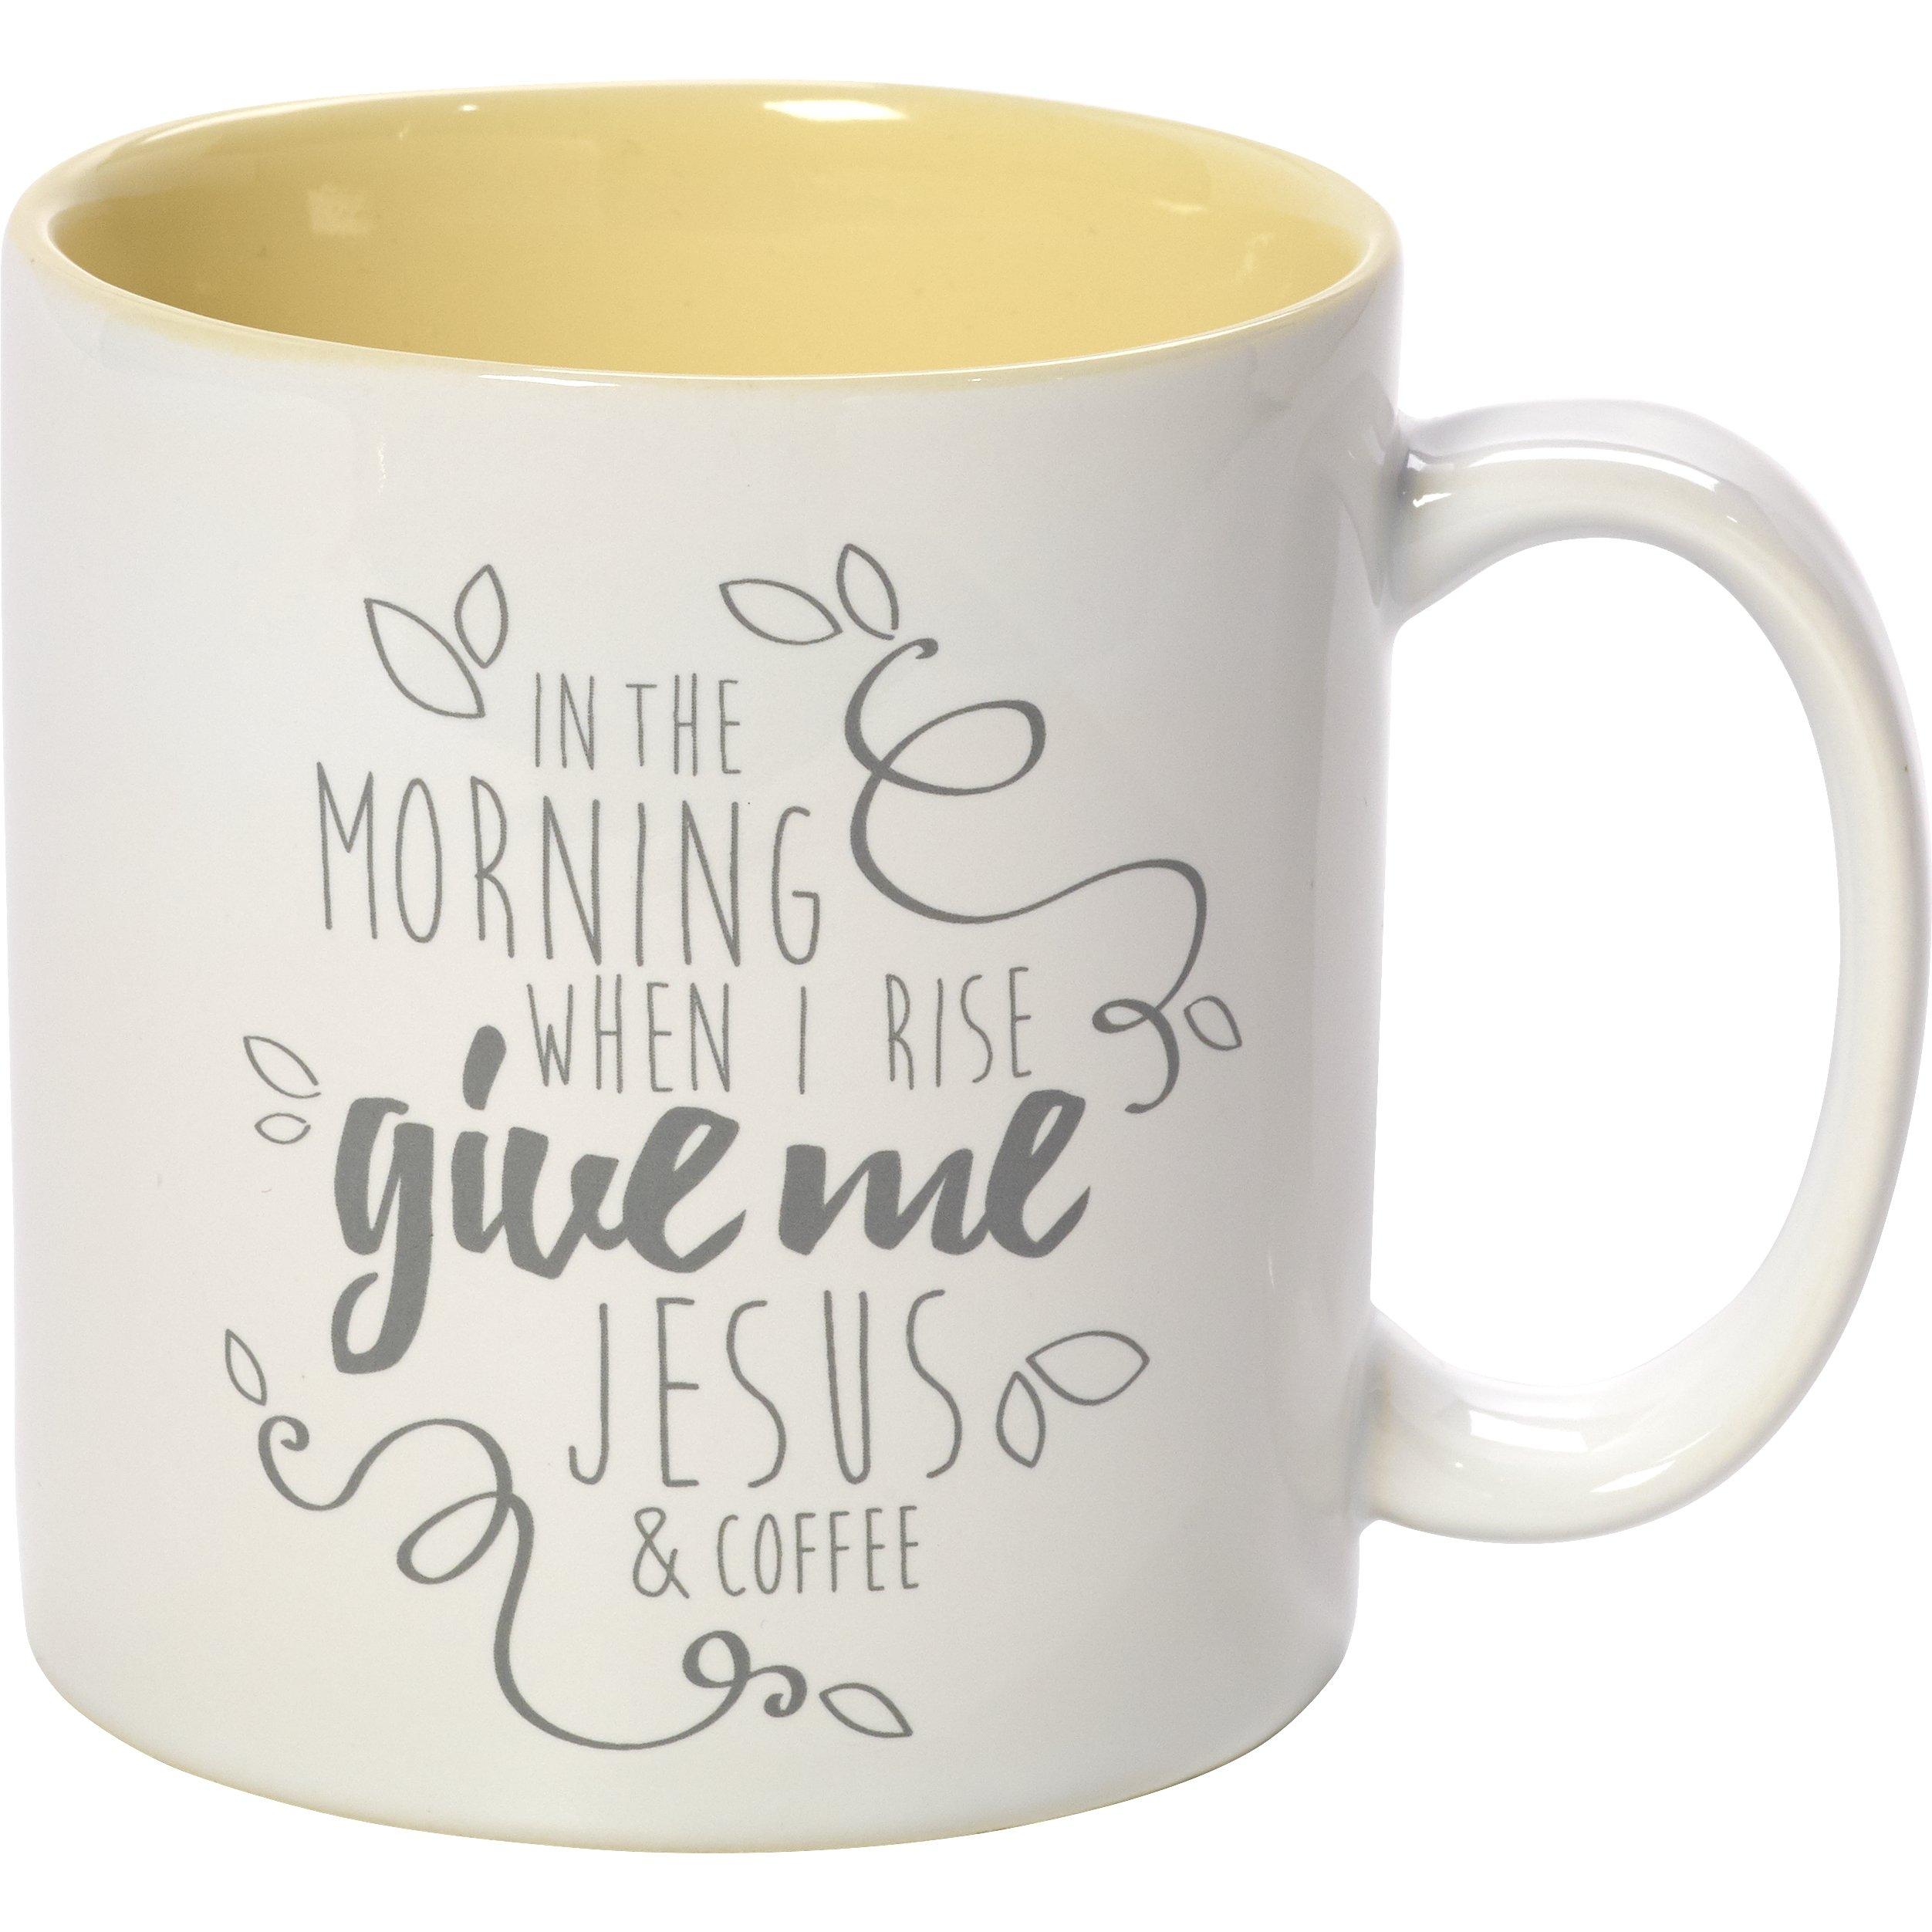 Precious Moments 173415 Yellow Stoneware 11oz Coffee Mug Inspirational Home Decor, One Size, Multi by Precious Moments